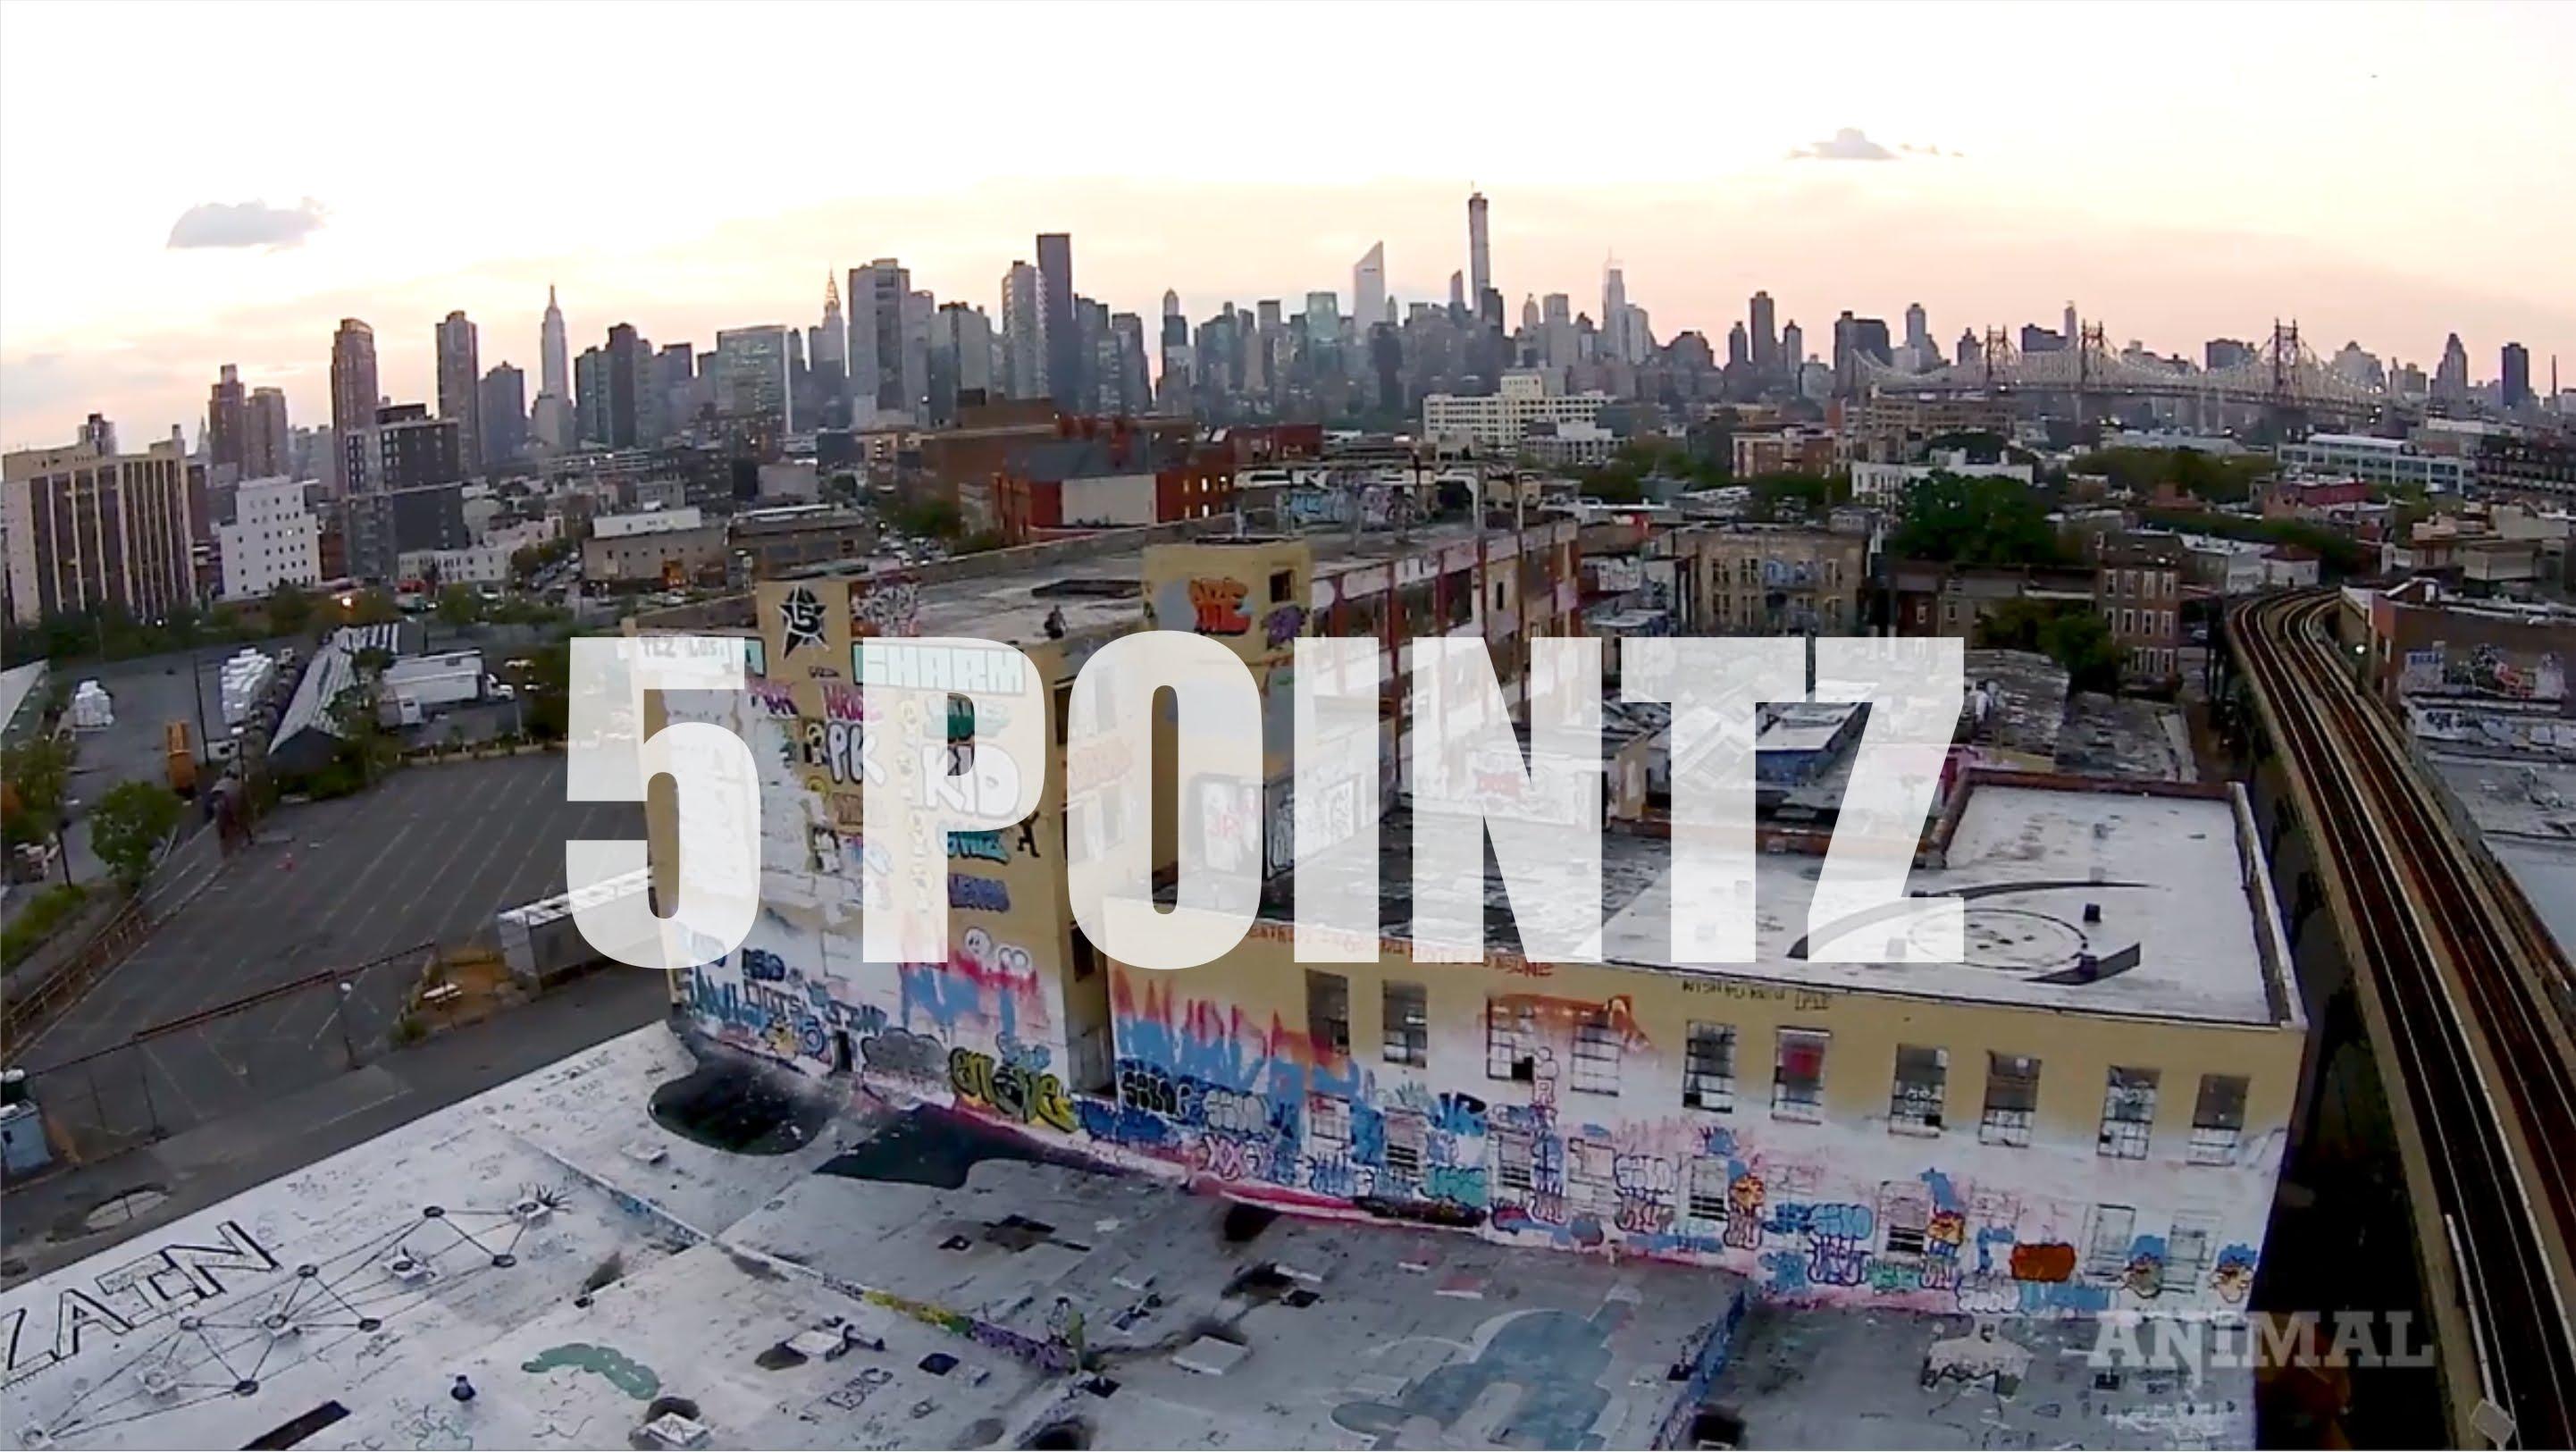 5 Points : #Graffiti